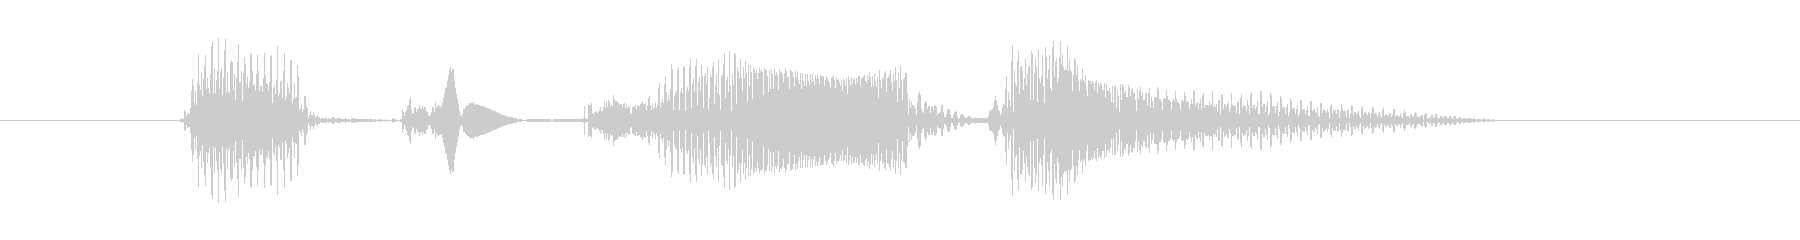 OCTOBER(オクトーバー・Octo…の未再生の波形